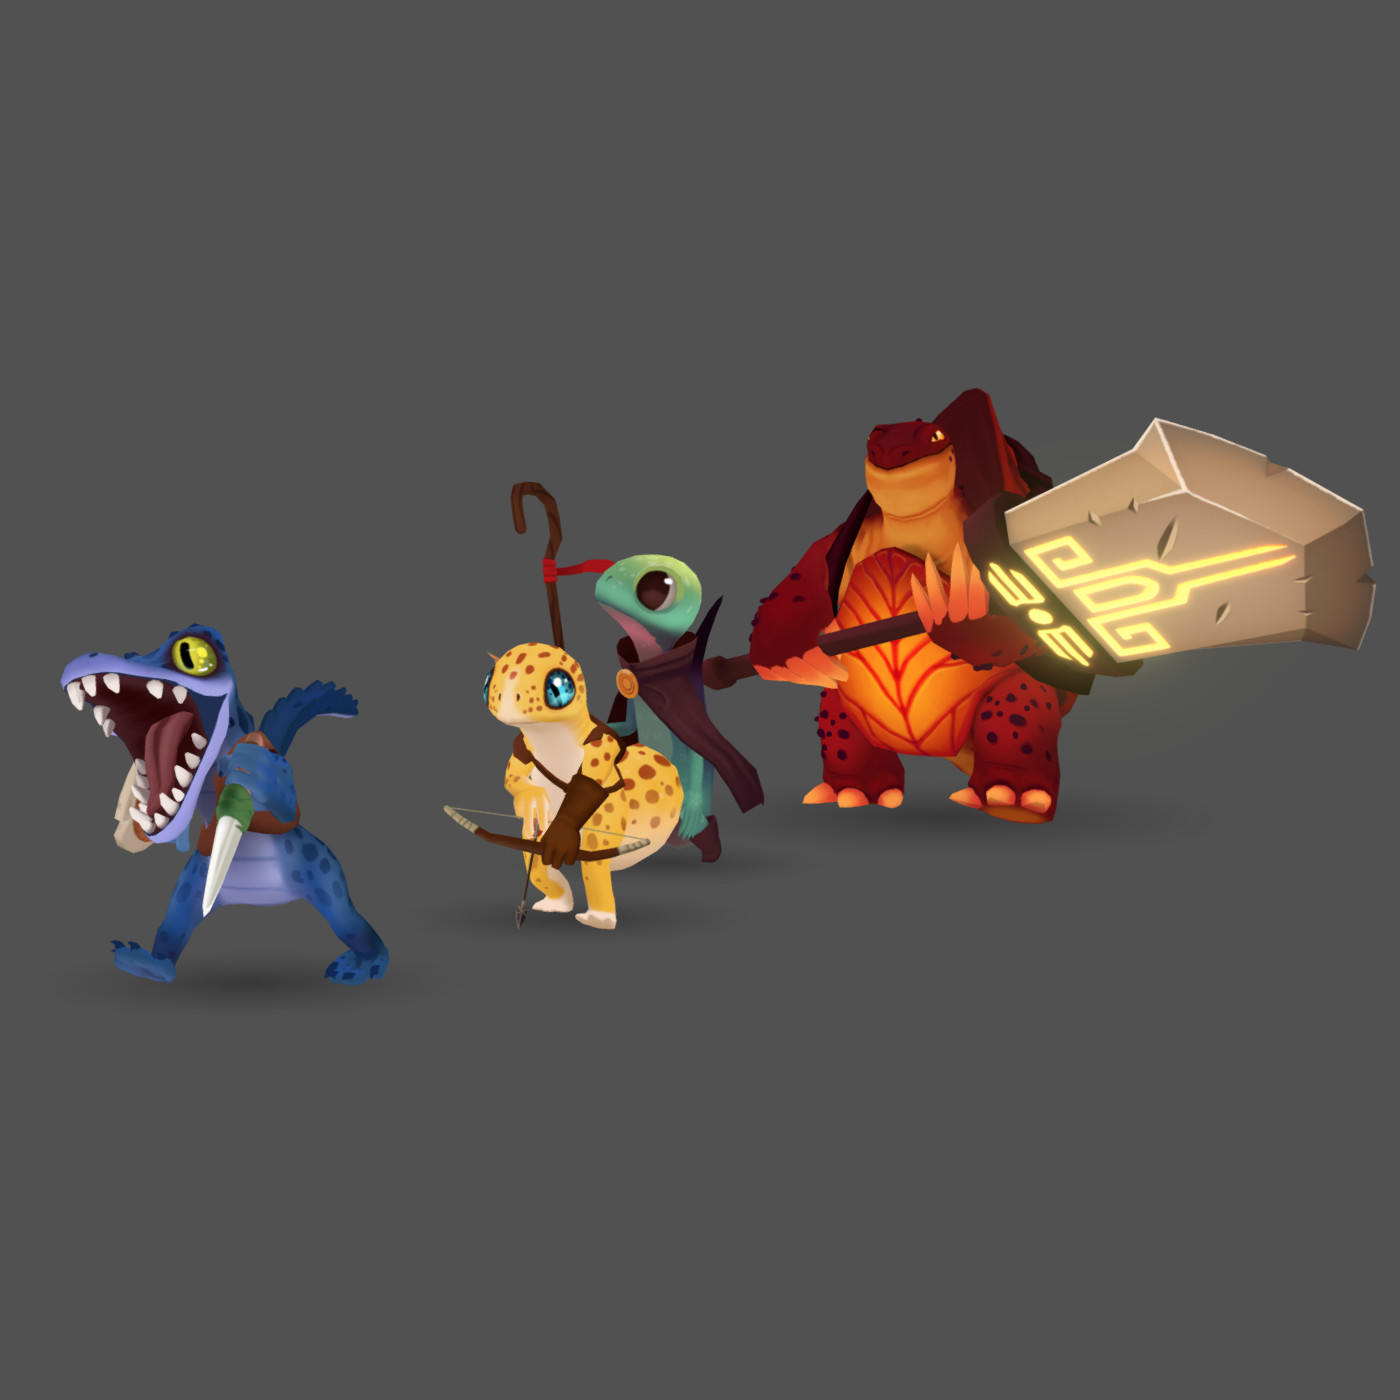 ArtStation - Lizard Squad, Justin T Phillips